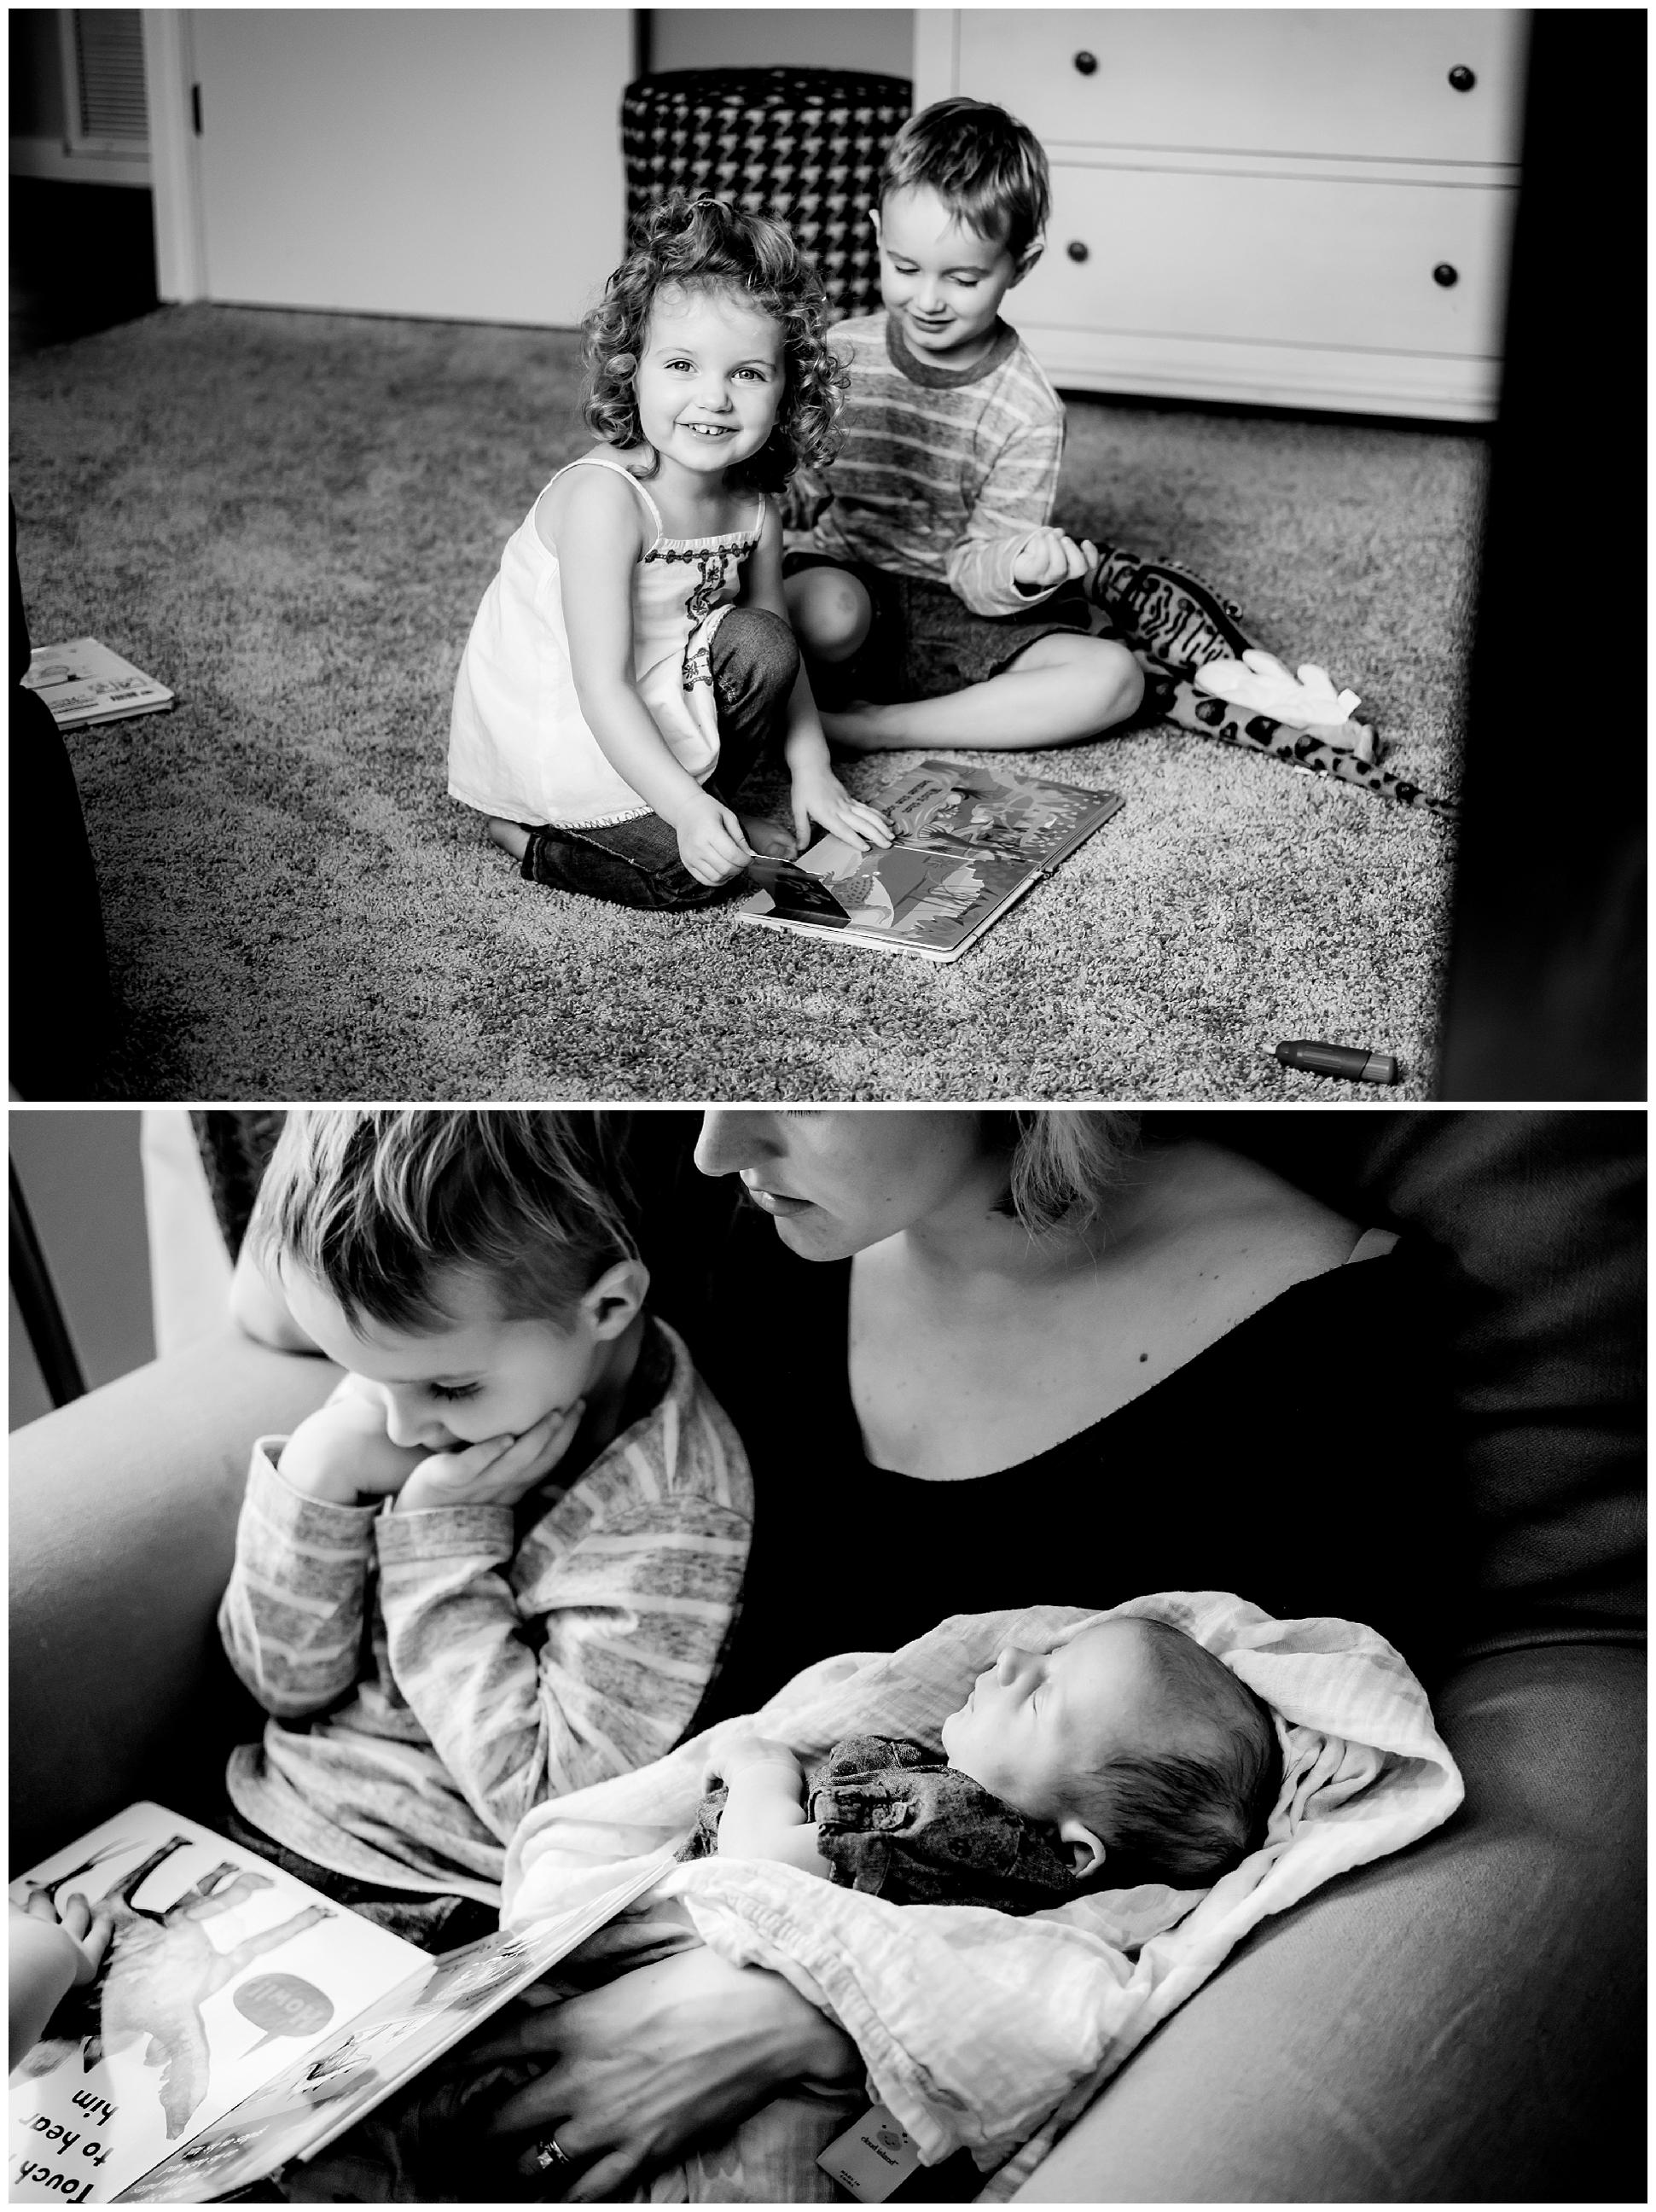 tampa-lifestyle-portrait-photographer-in-home-pentax-film-vs-digital_0029.jpg